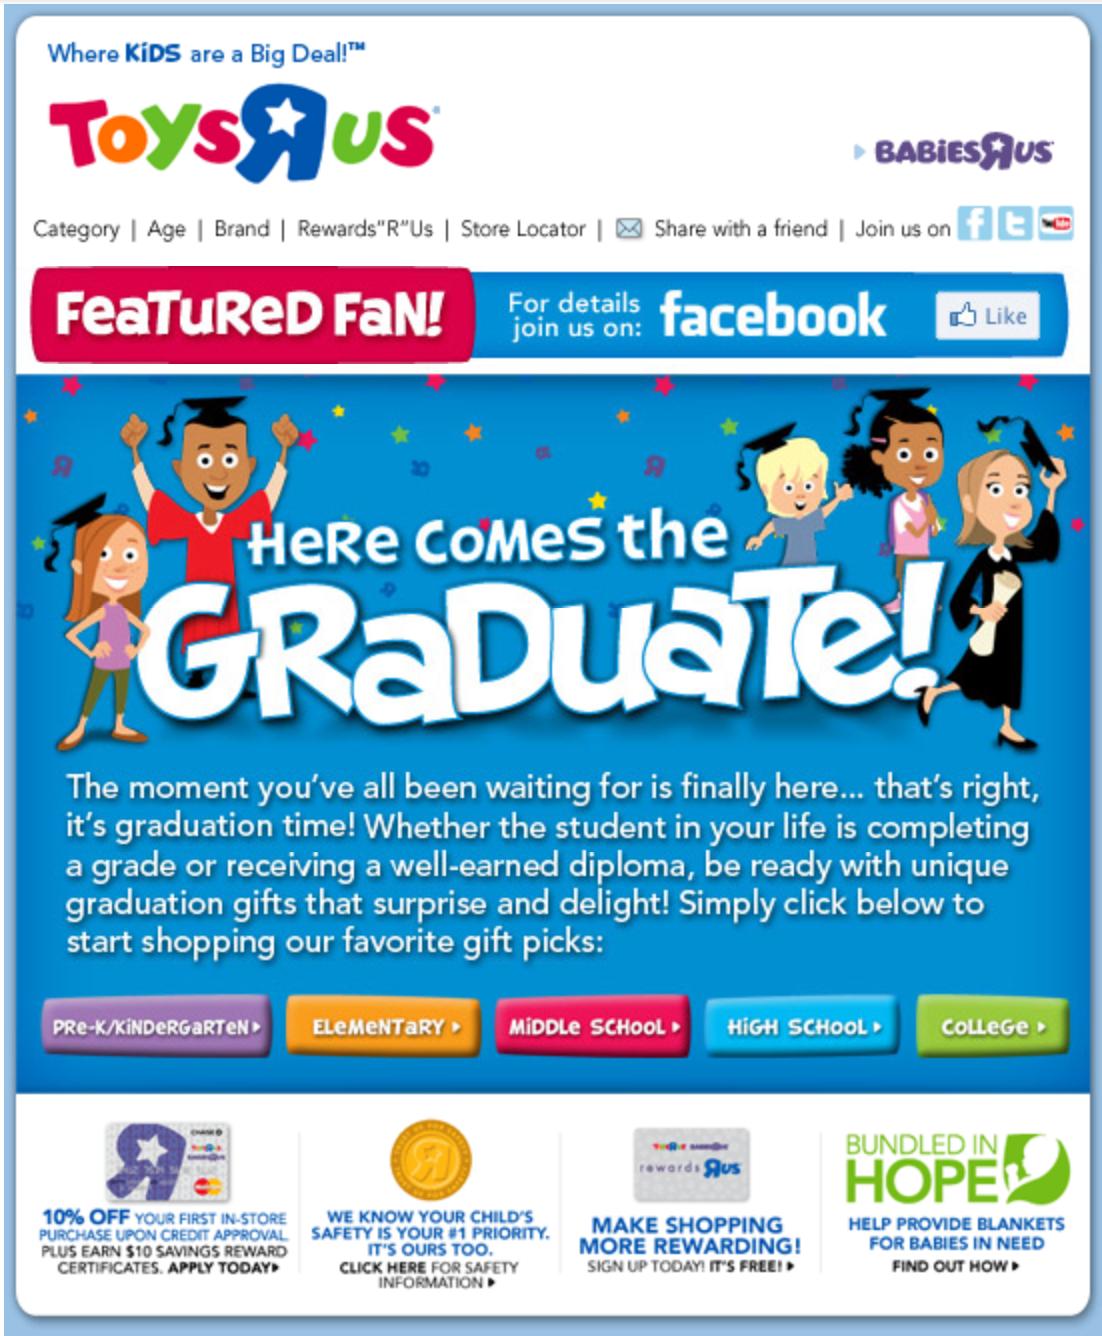 Email: Graduation